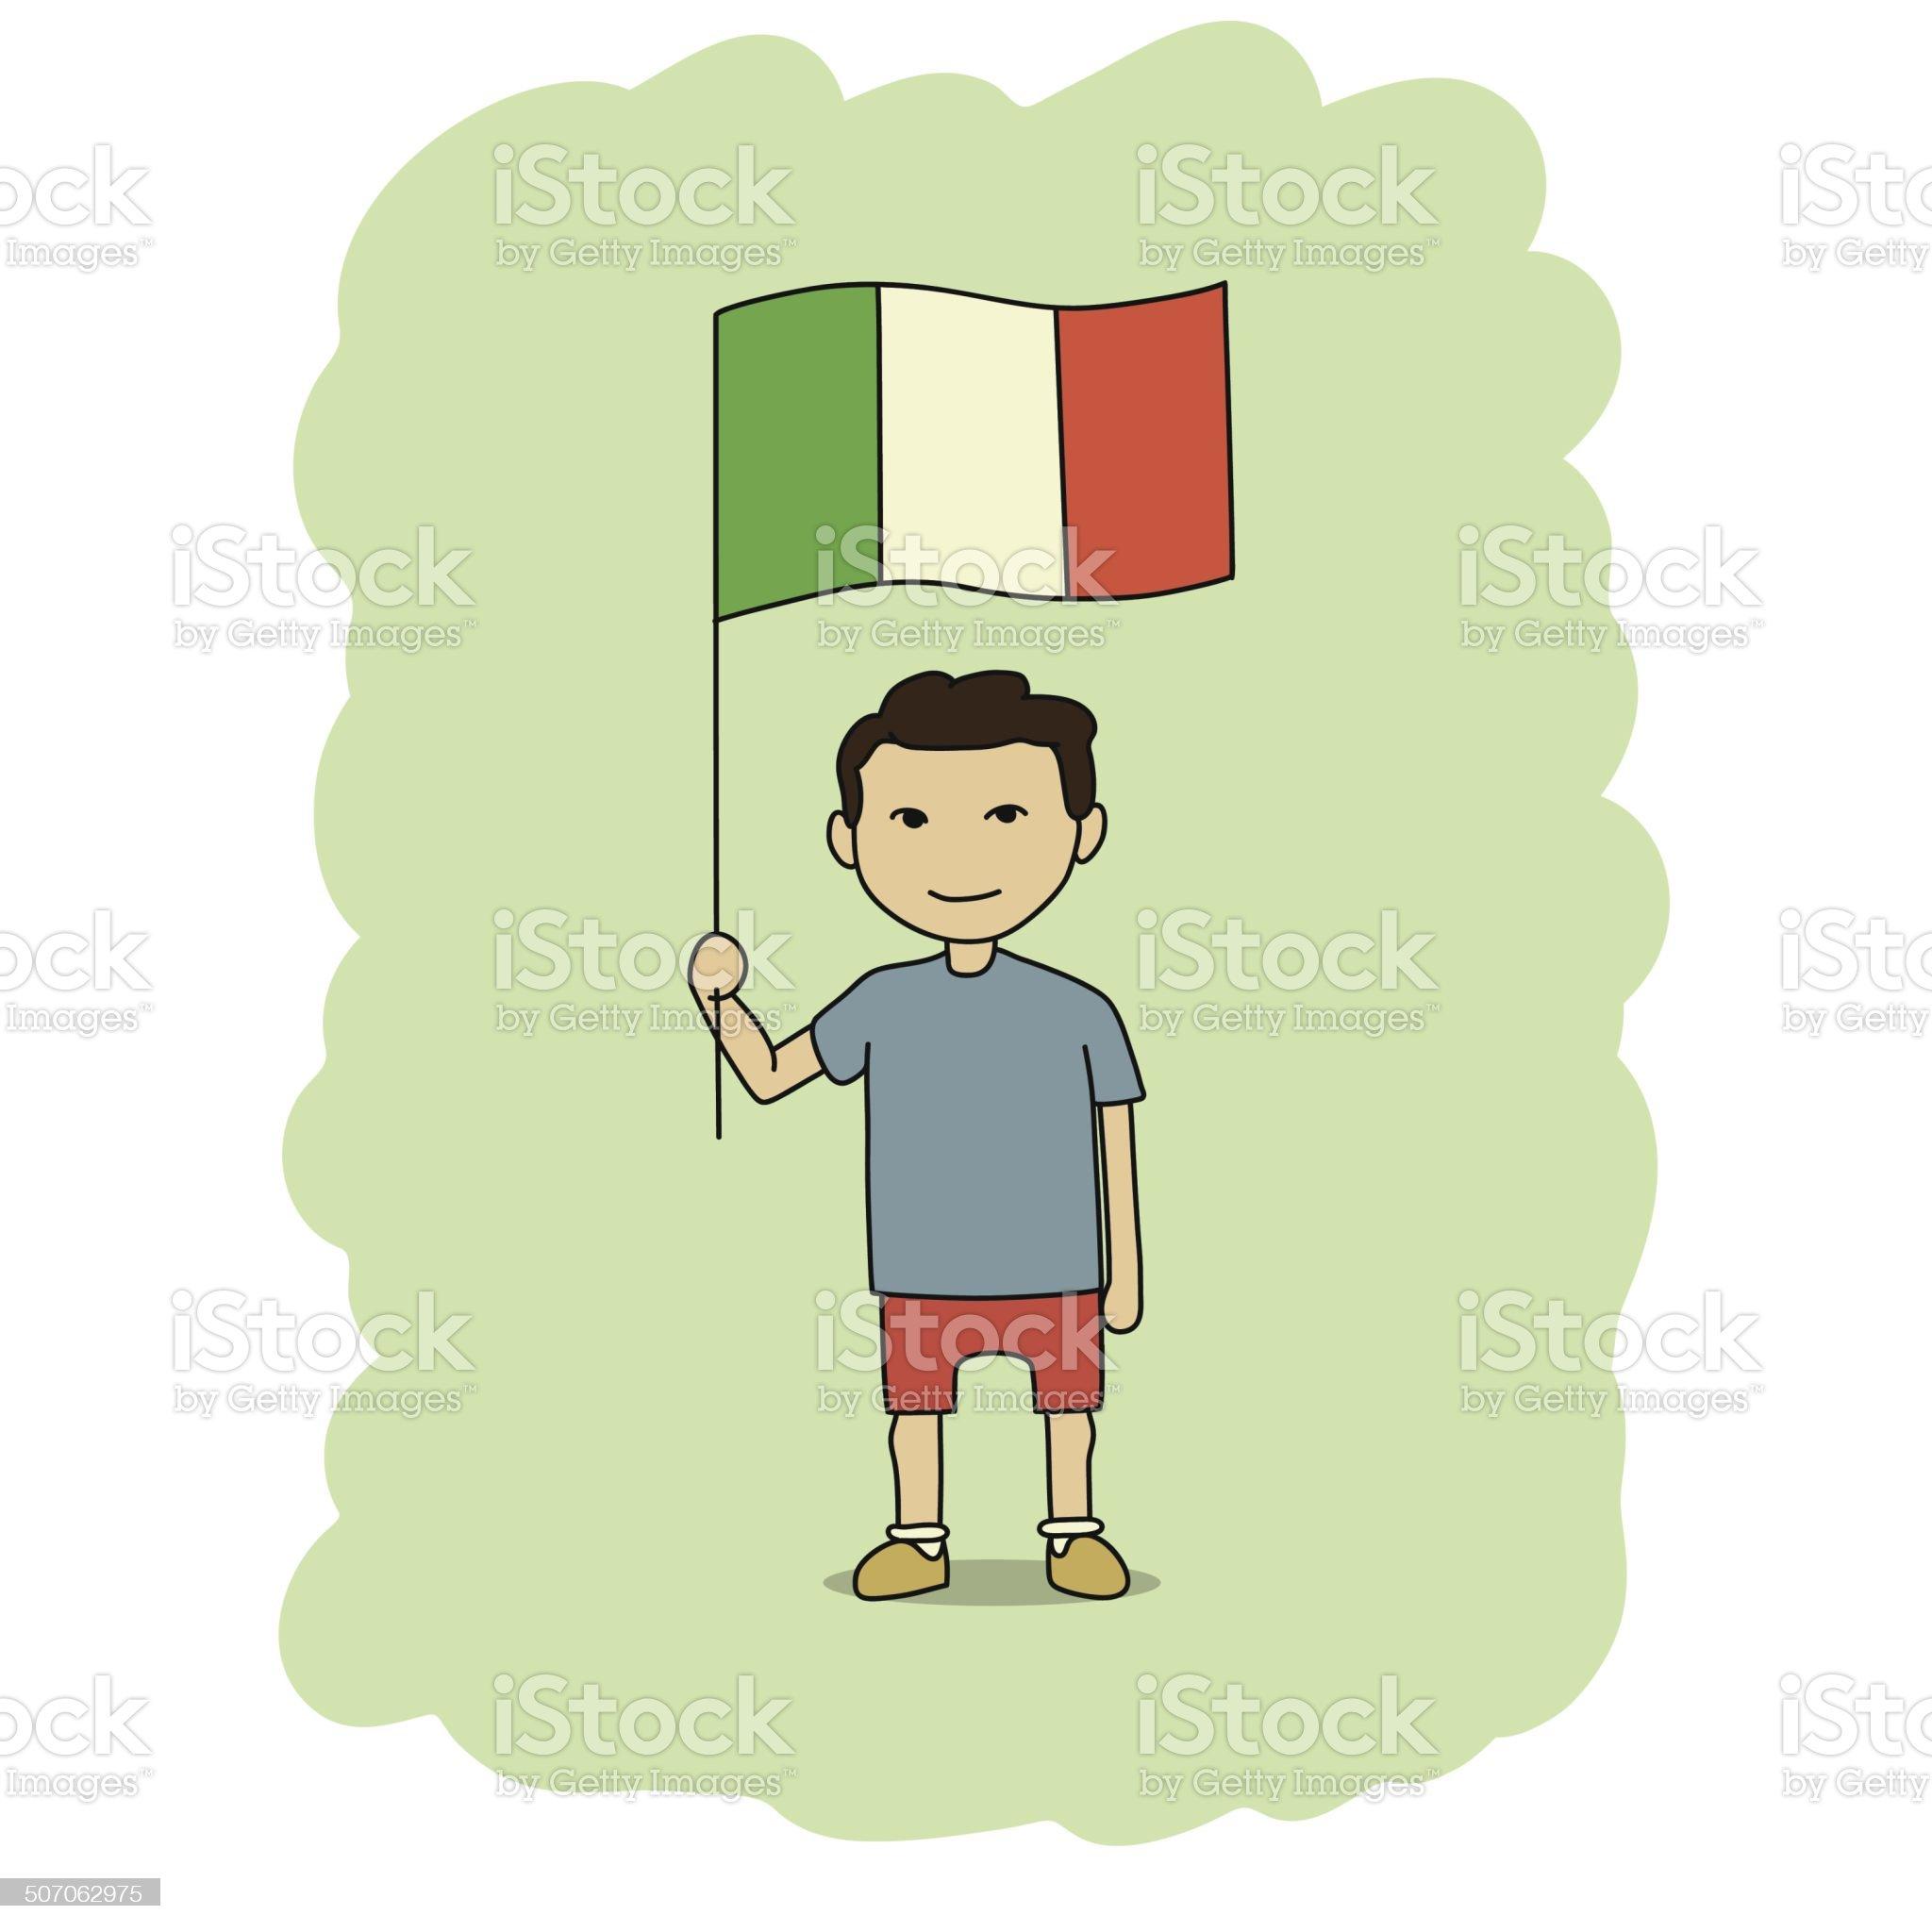 Italy flag royalty-free stock vector art